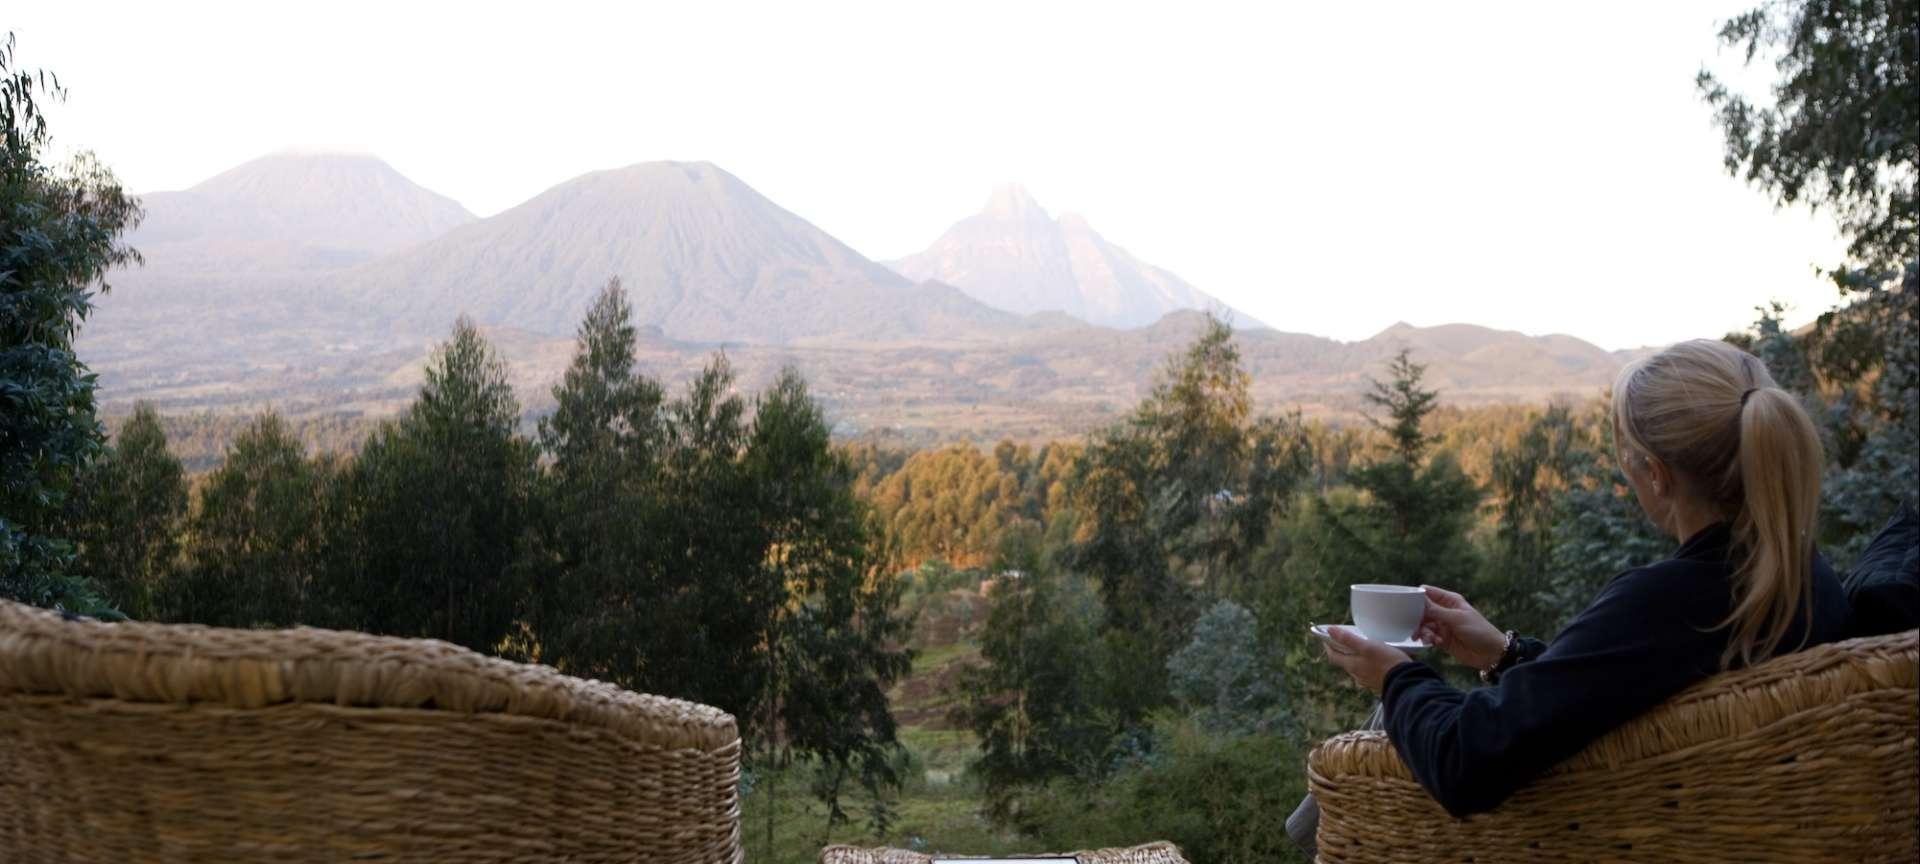 Sabinyo Silverback Lodge scenic view